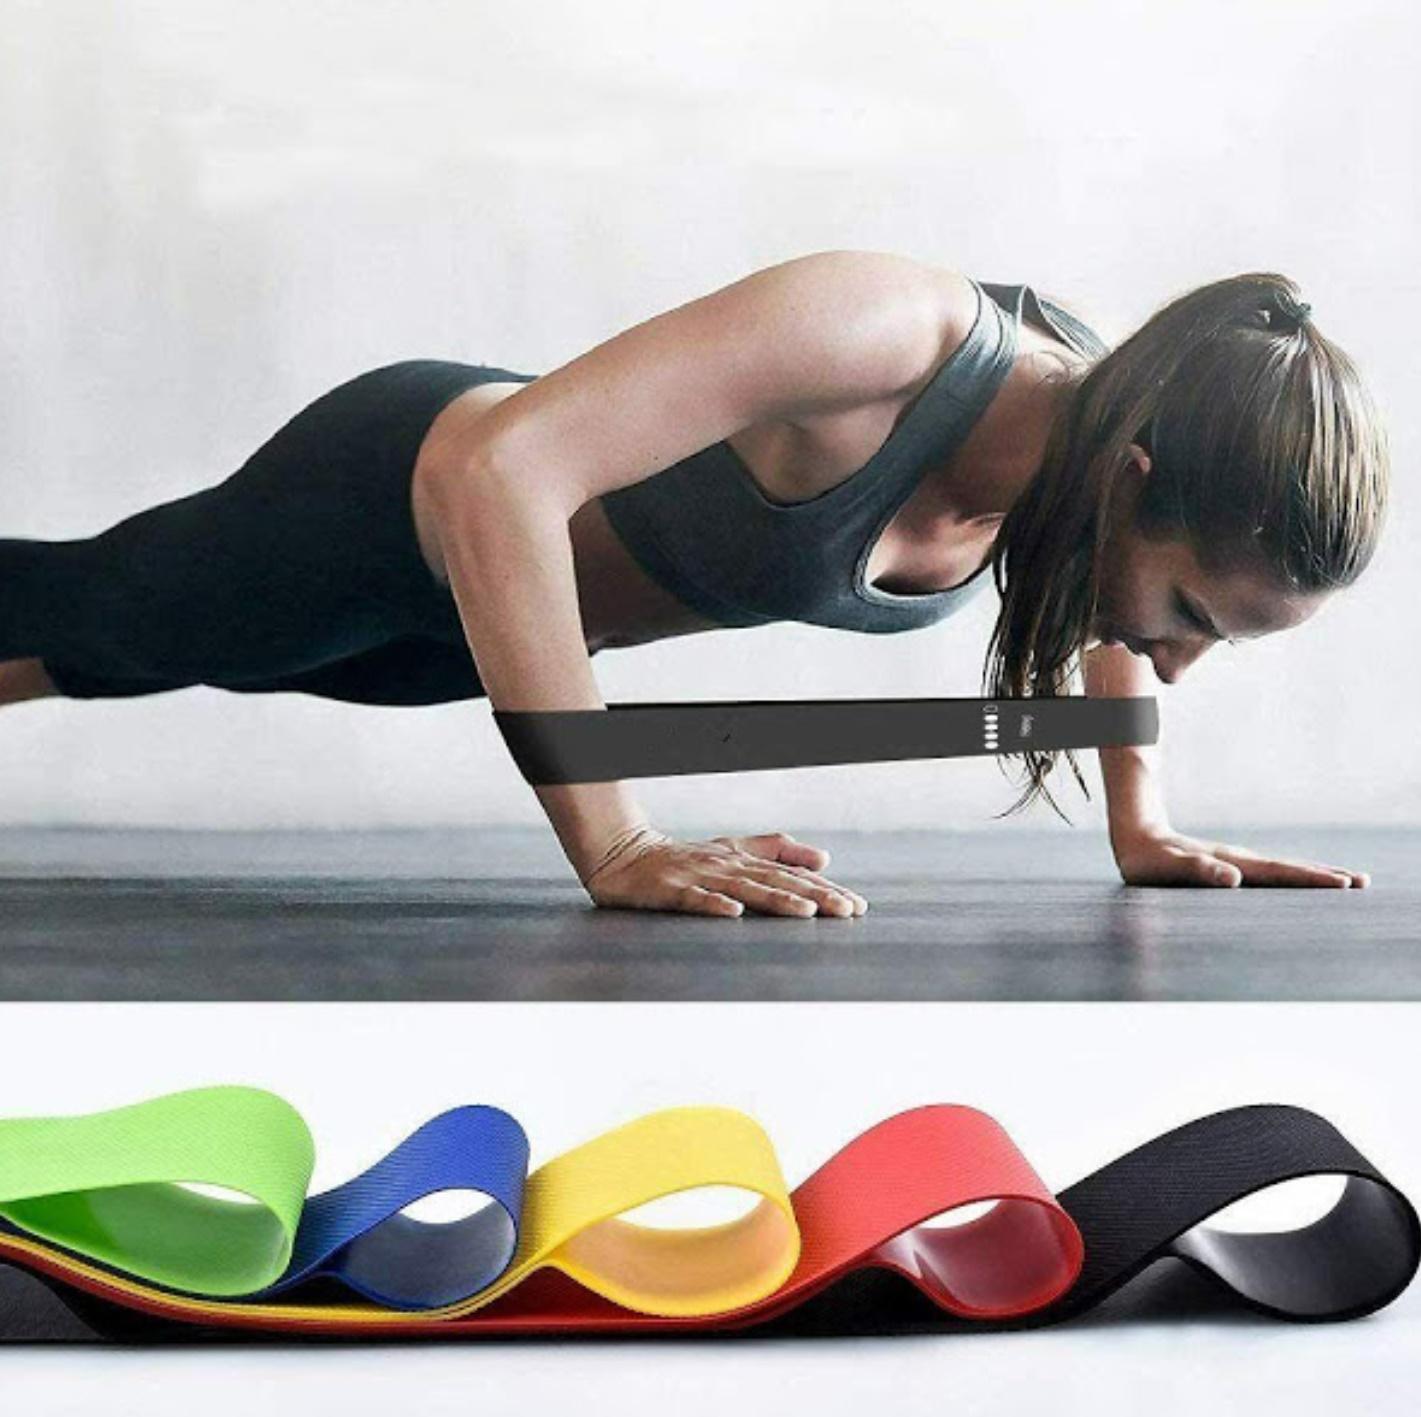 Centura pentru slabit SWEET SWEAT Waist Trimmer +  CADOU 5 benzi elastice de rezistenta pentru fitness, yoga, antrenamente